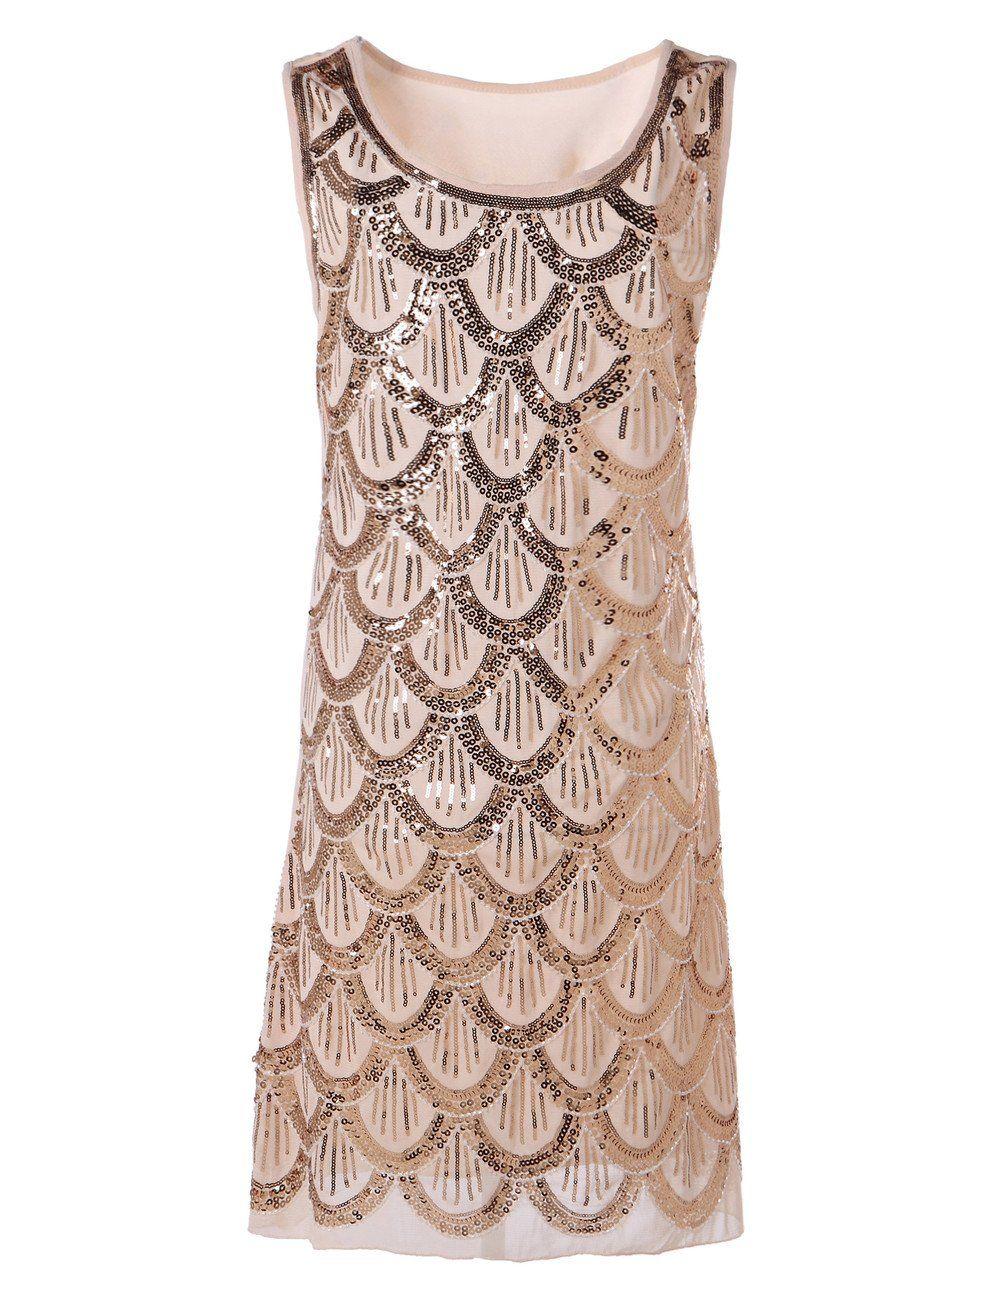 217aa849 PrettyGuide Women Art Deco Mermaid Sequin Fishscale Flapper Glam Party Dress  Beige at Amazon Women's Clothing store: